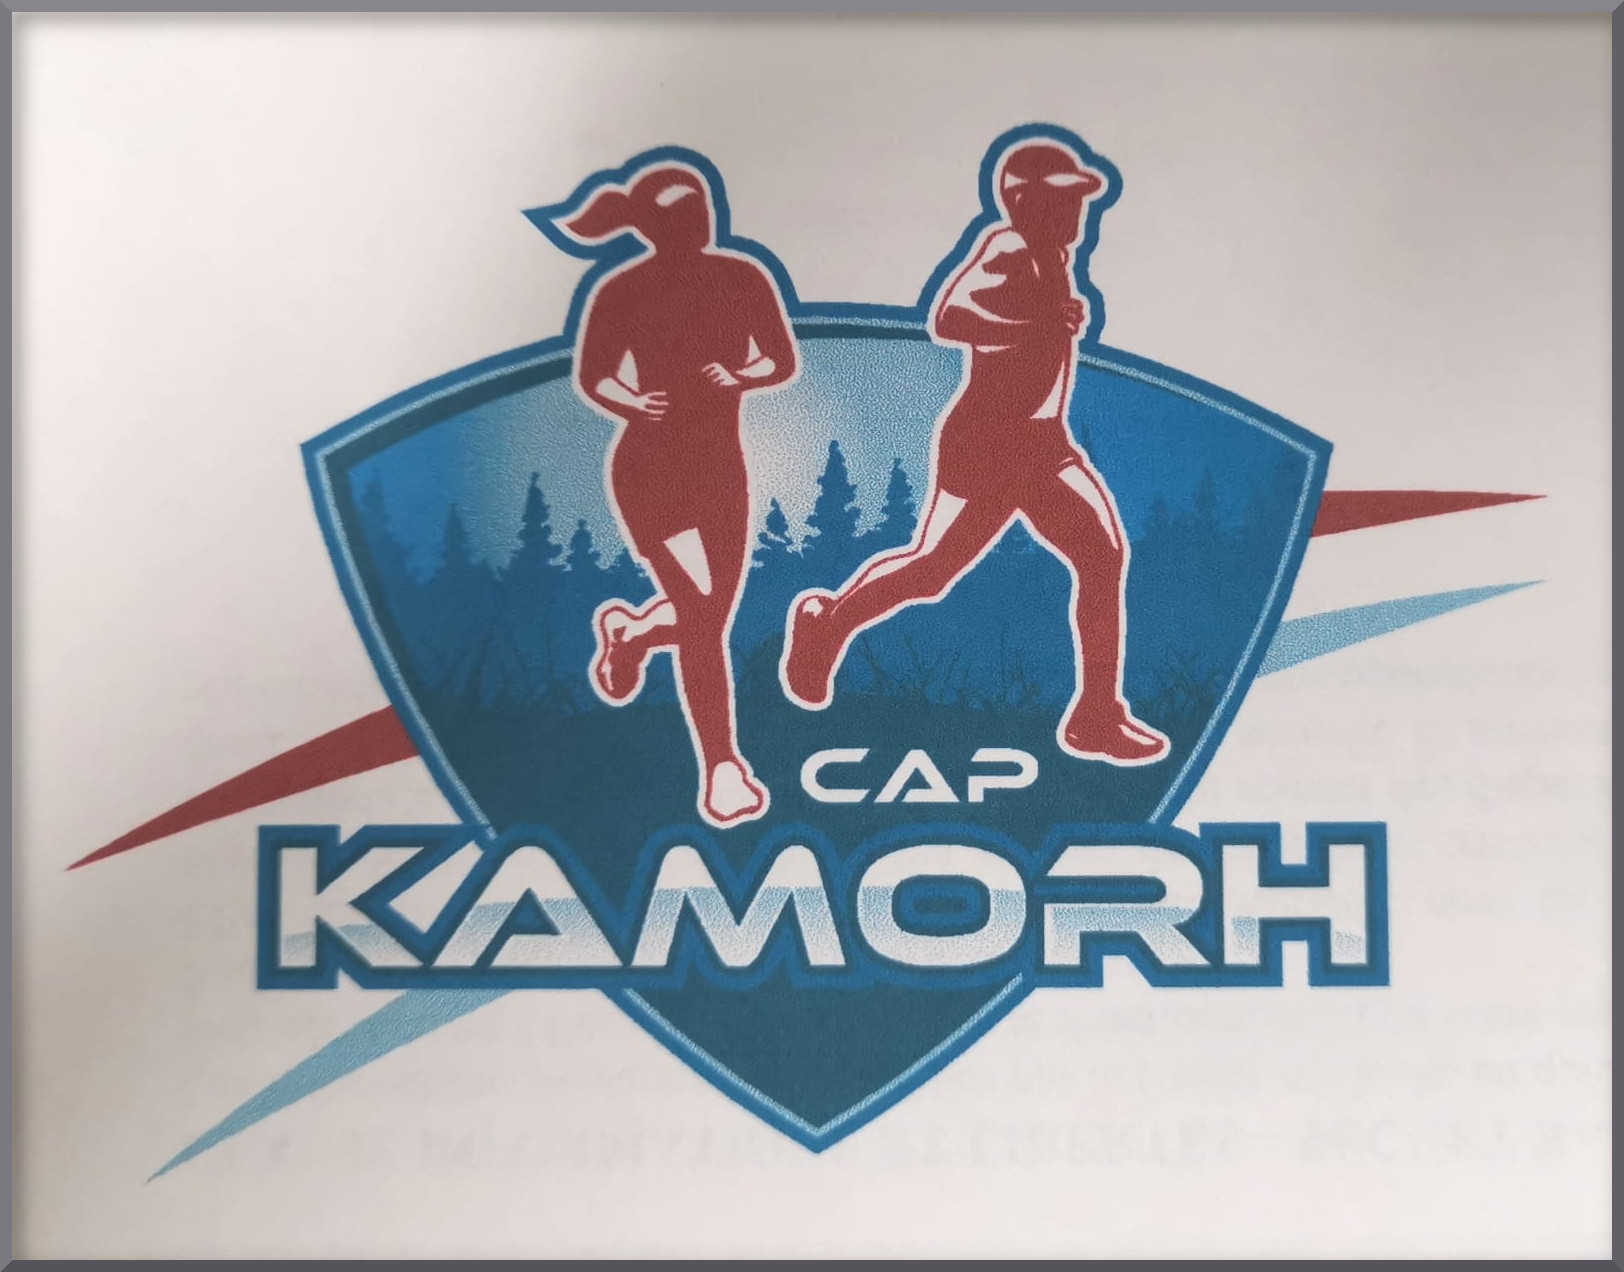 cap Kamorh logo.jpg